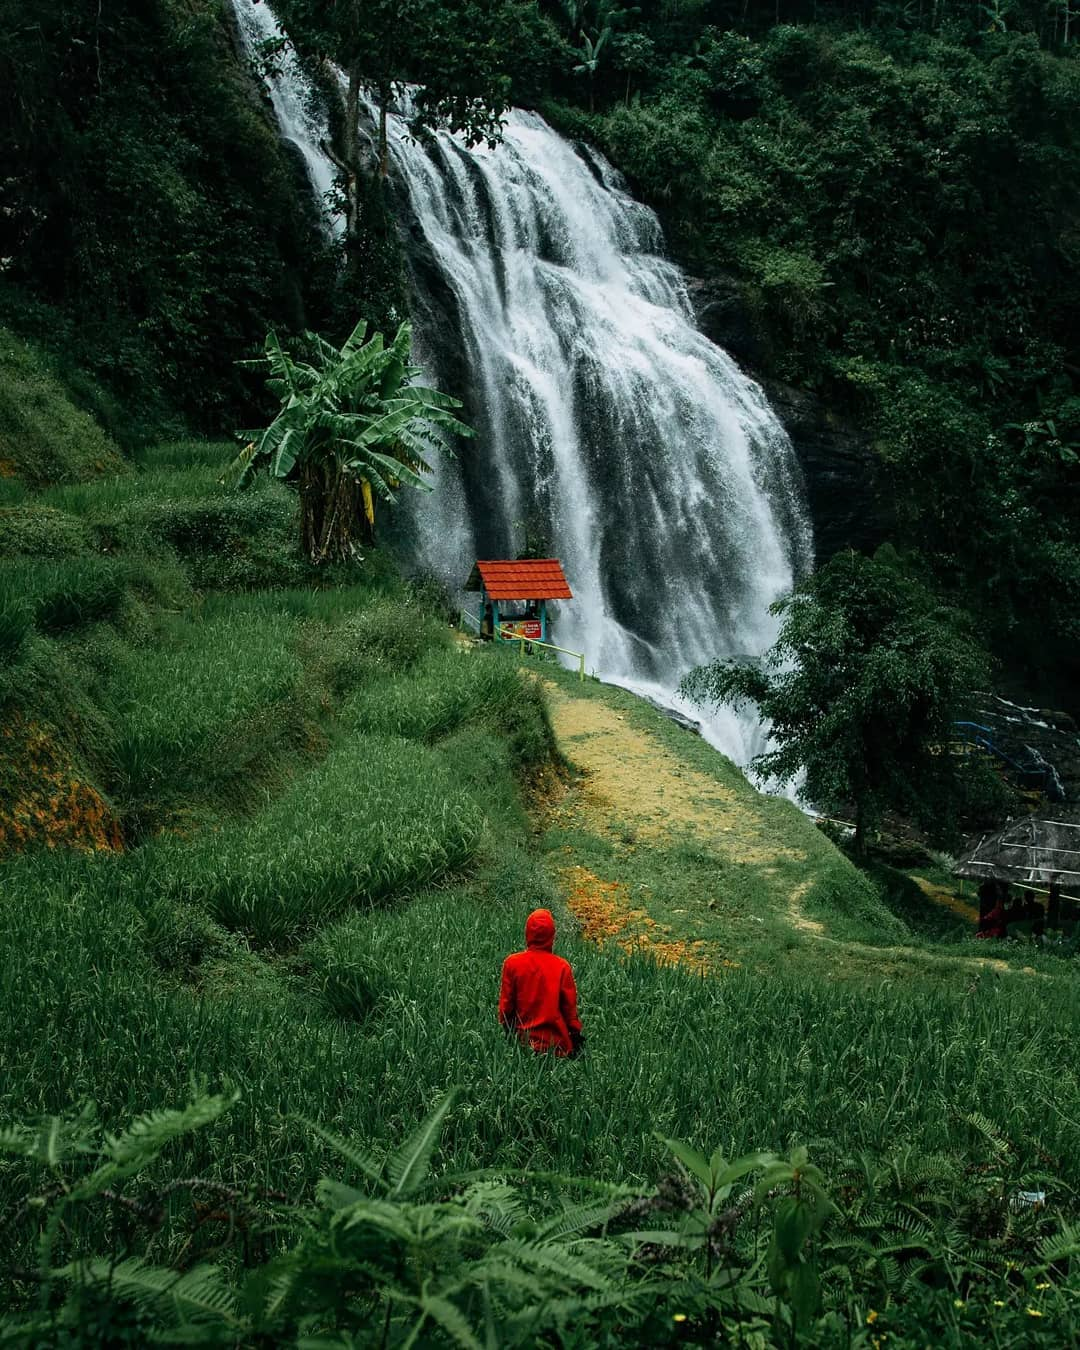 Hijaunya Alam Sekitar Curug Cikondang Image From @maul 96